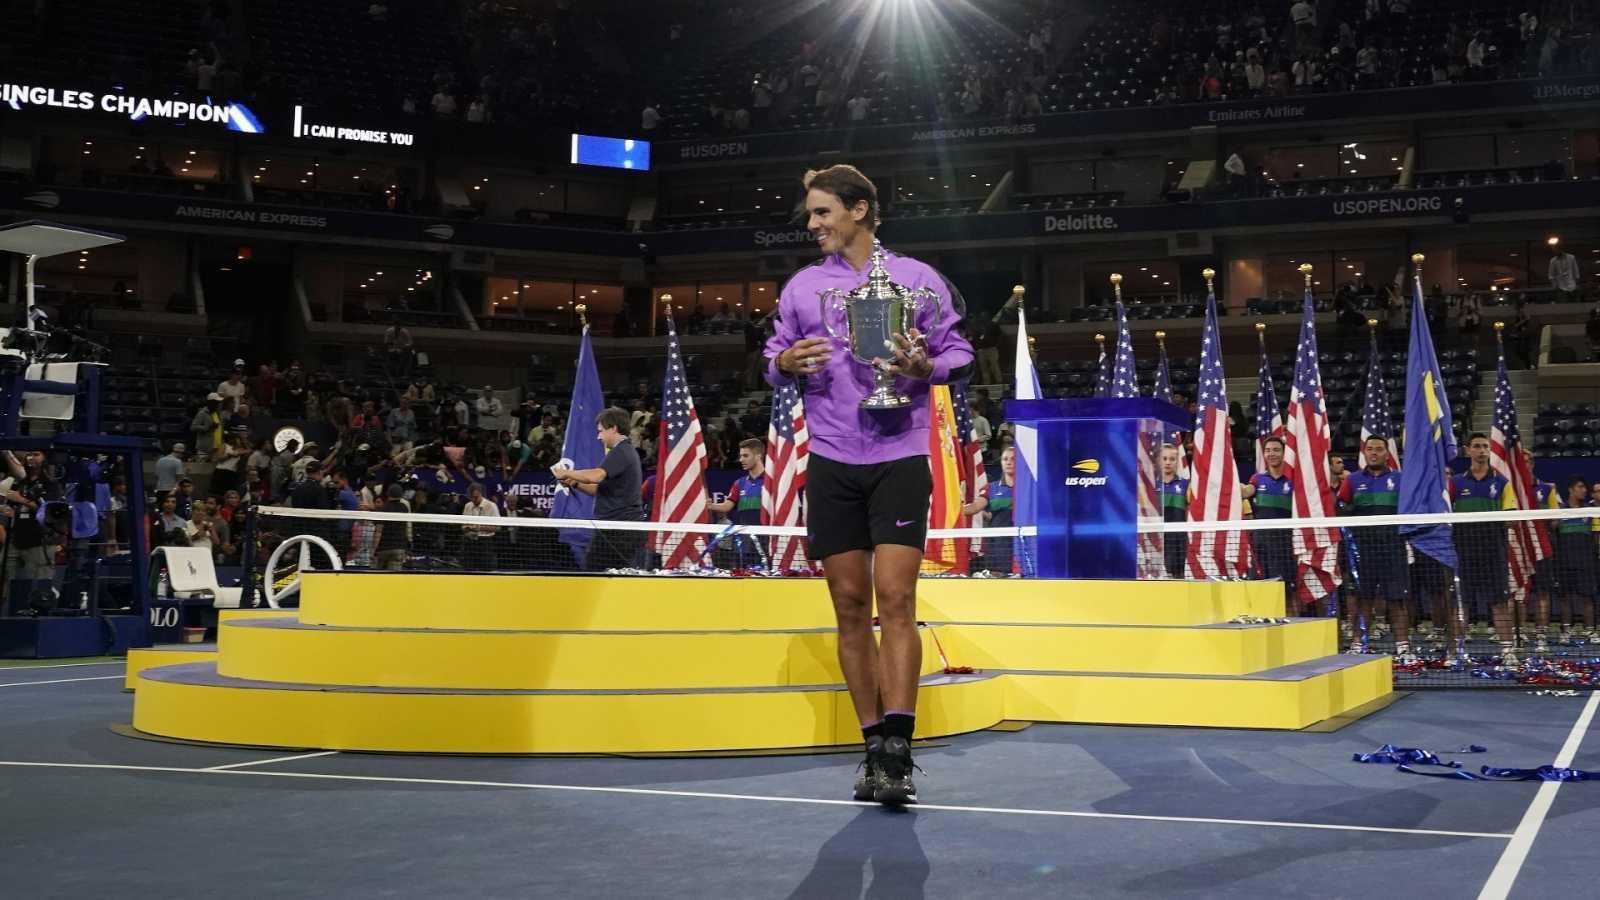 Rafa Nadal, campeón del US Open 2019